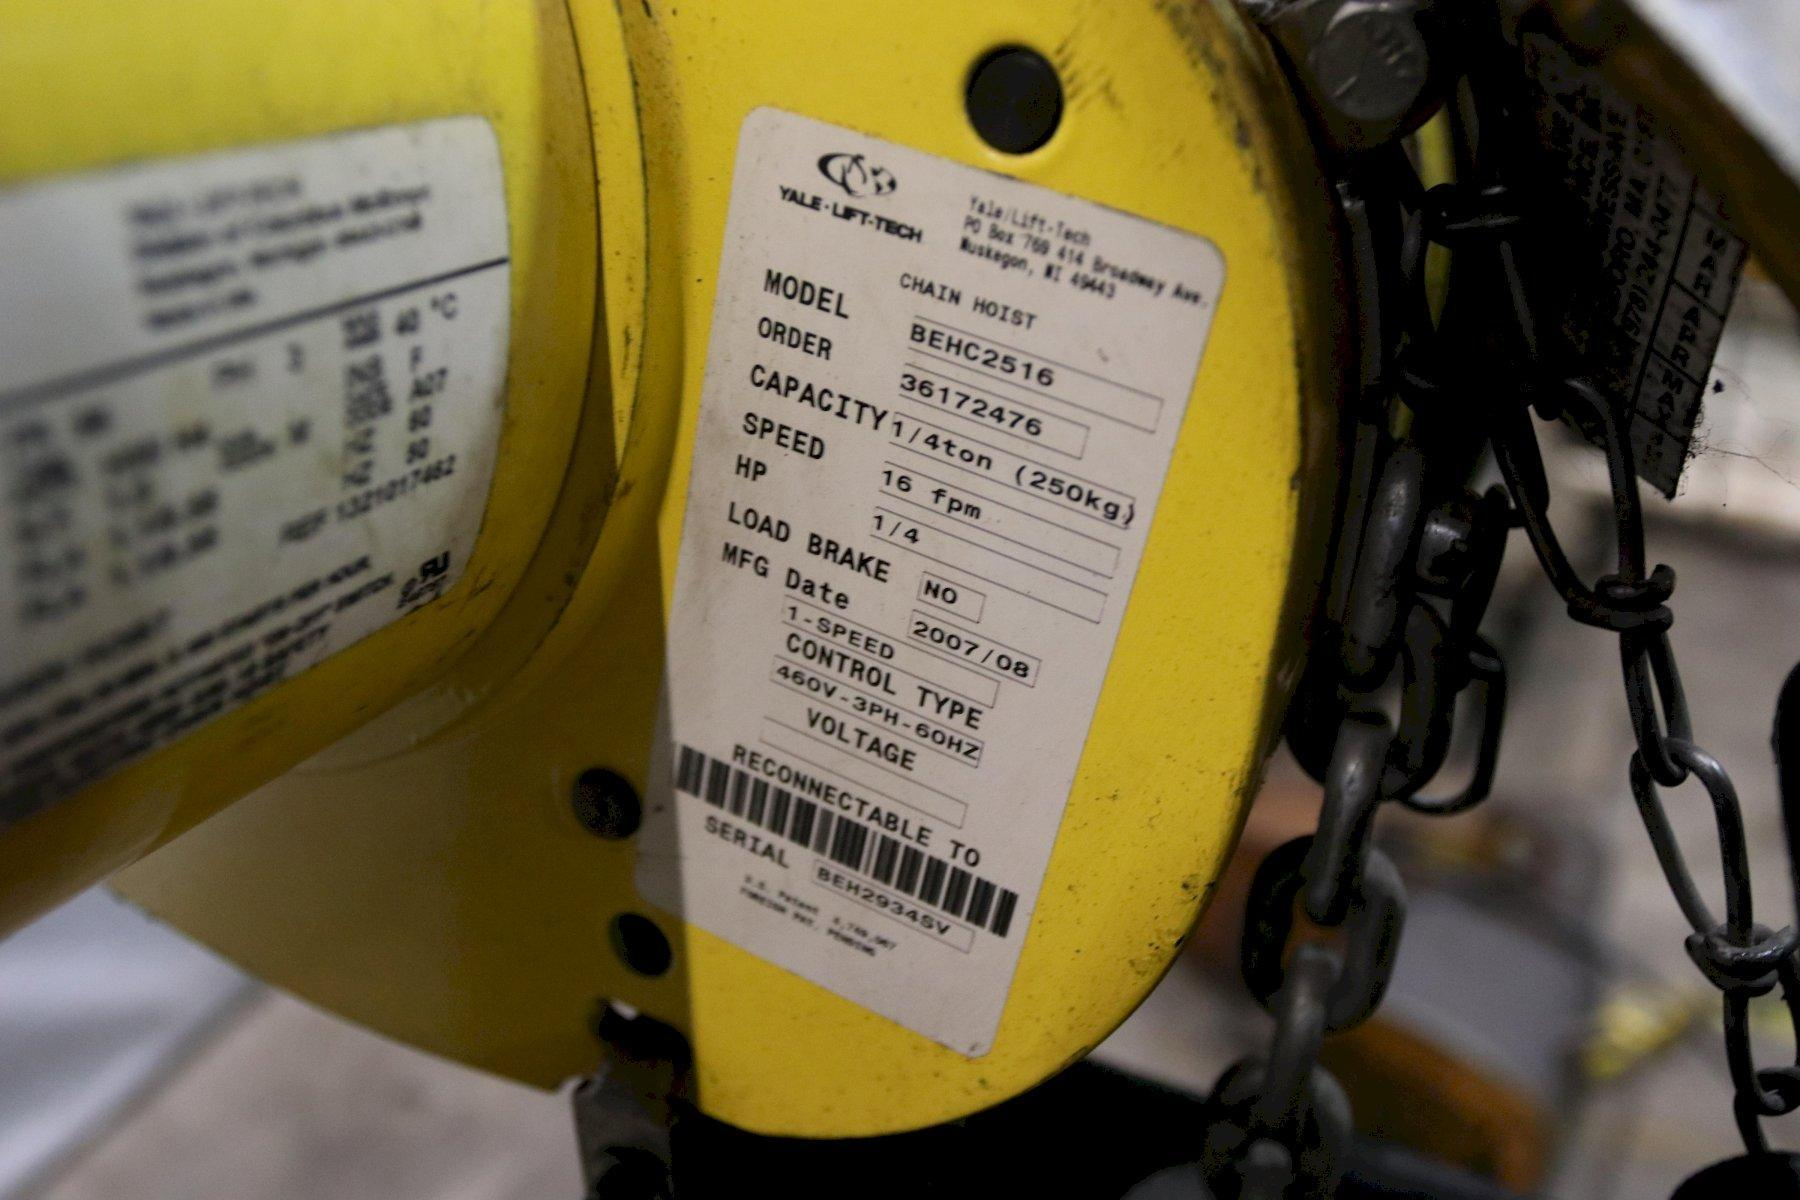 1/4 TON YALE  MODEL #BEHC2516 ELECTRIC POWERED CHAIN HOIST: STOCK #11978